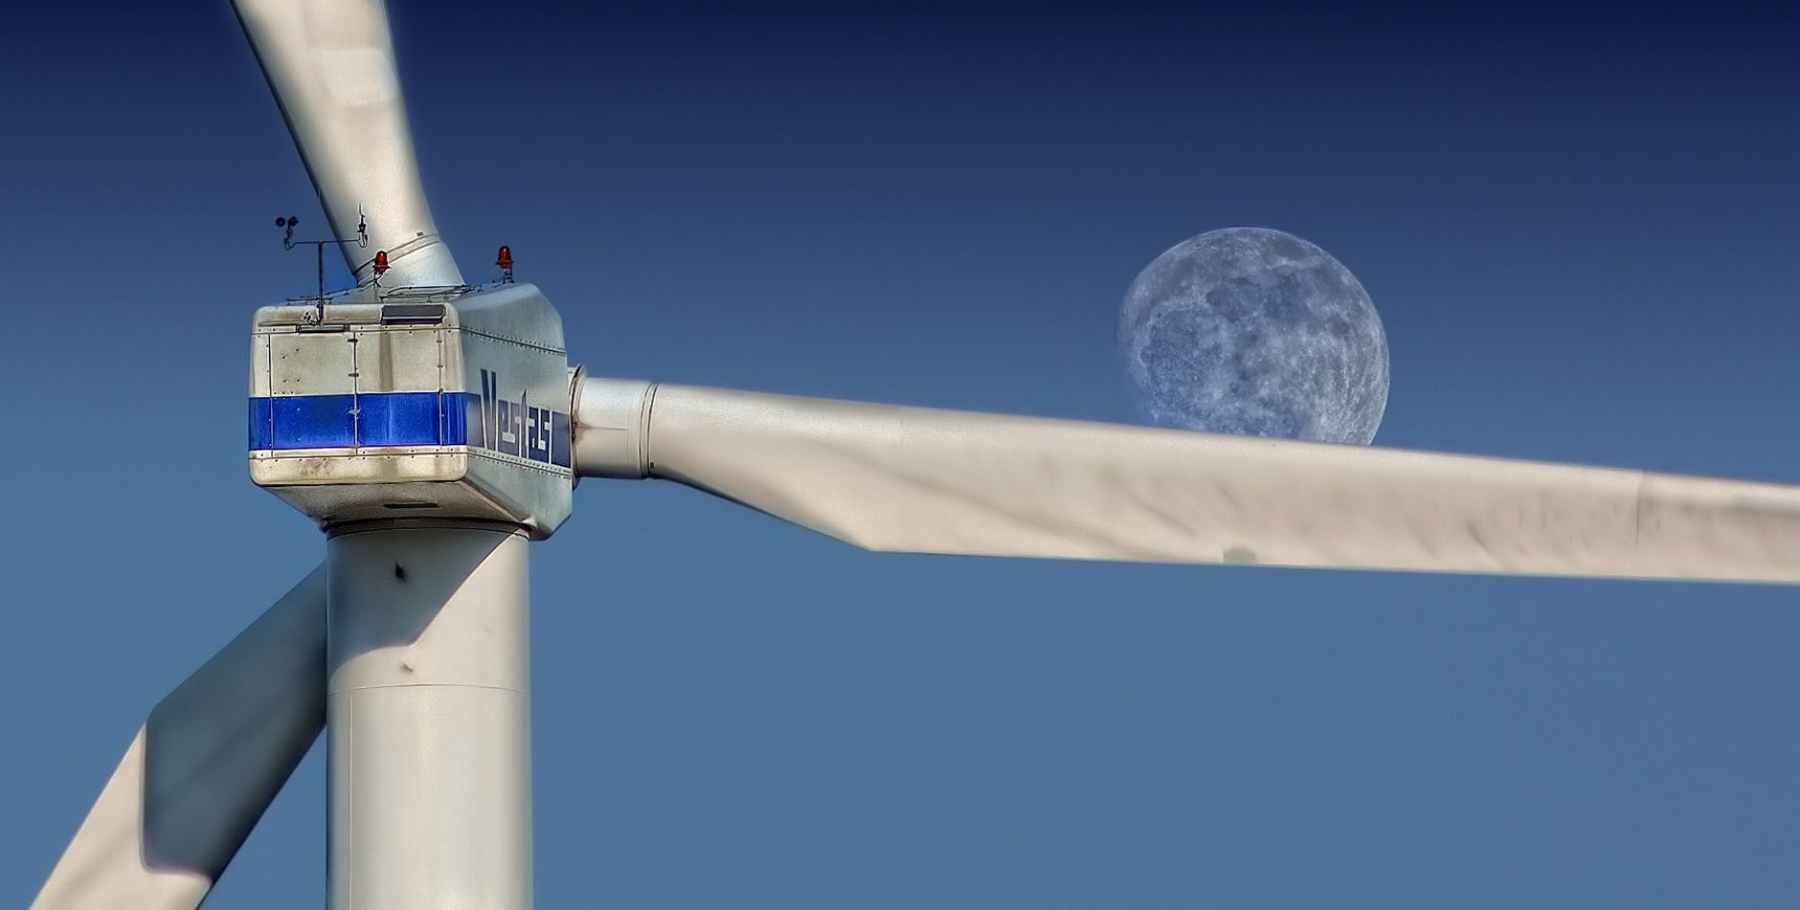 pinwheel-wind-power-enerie-environmental-technology.jpg